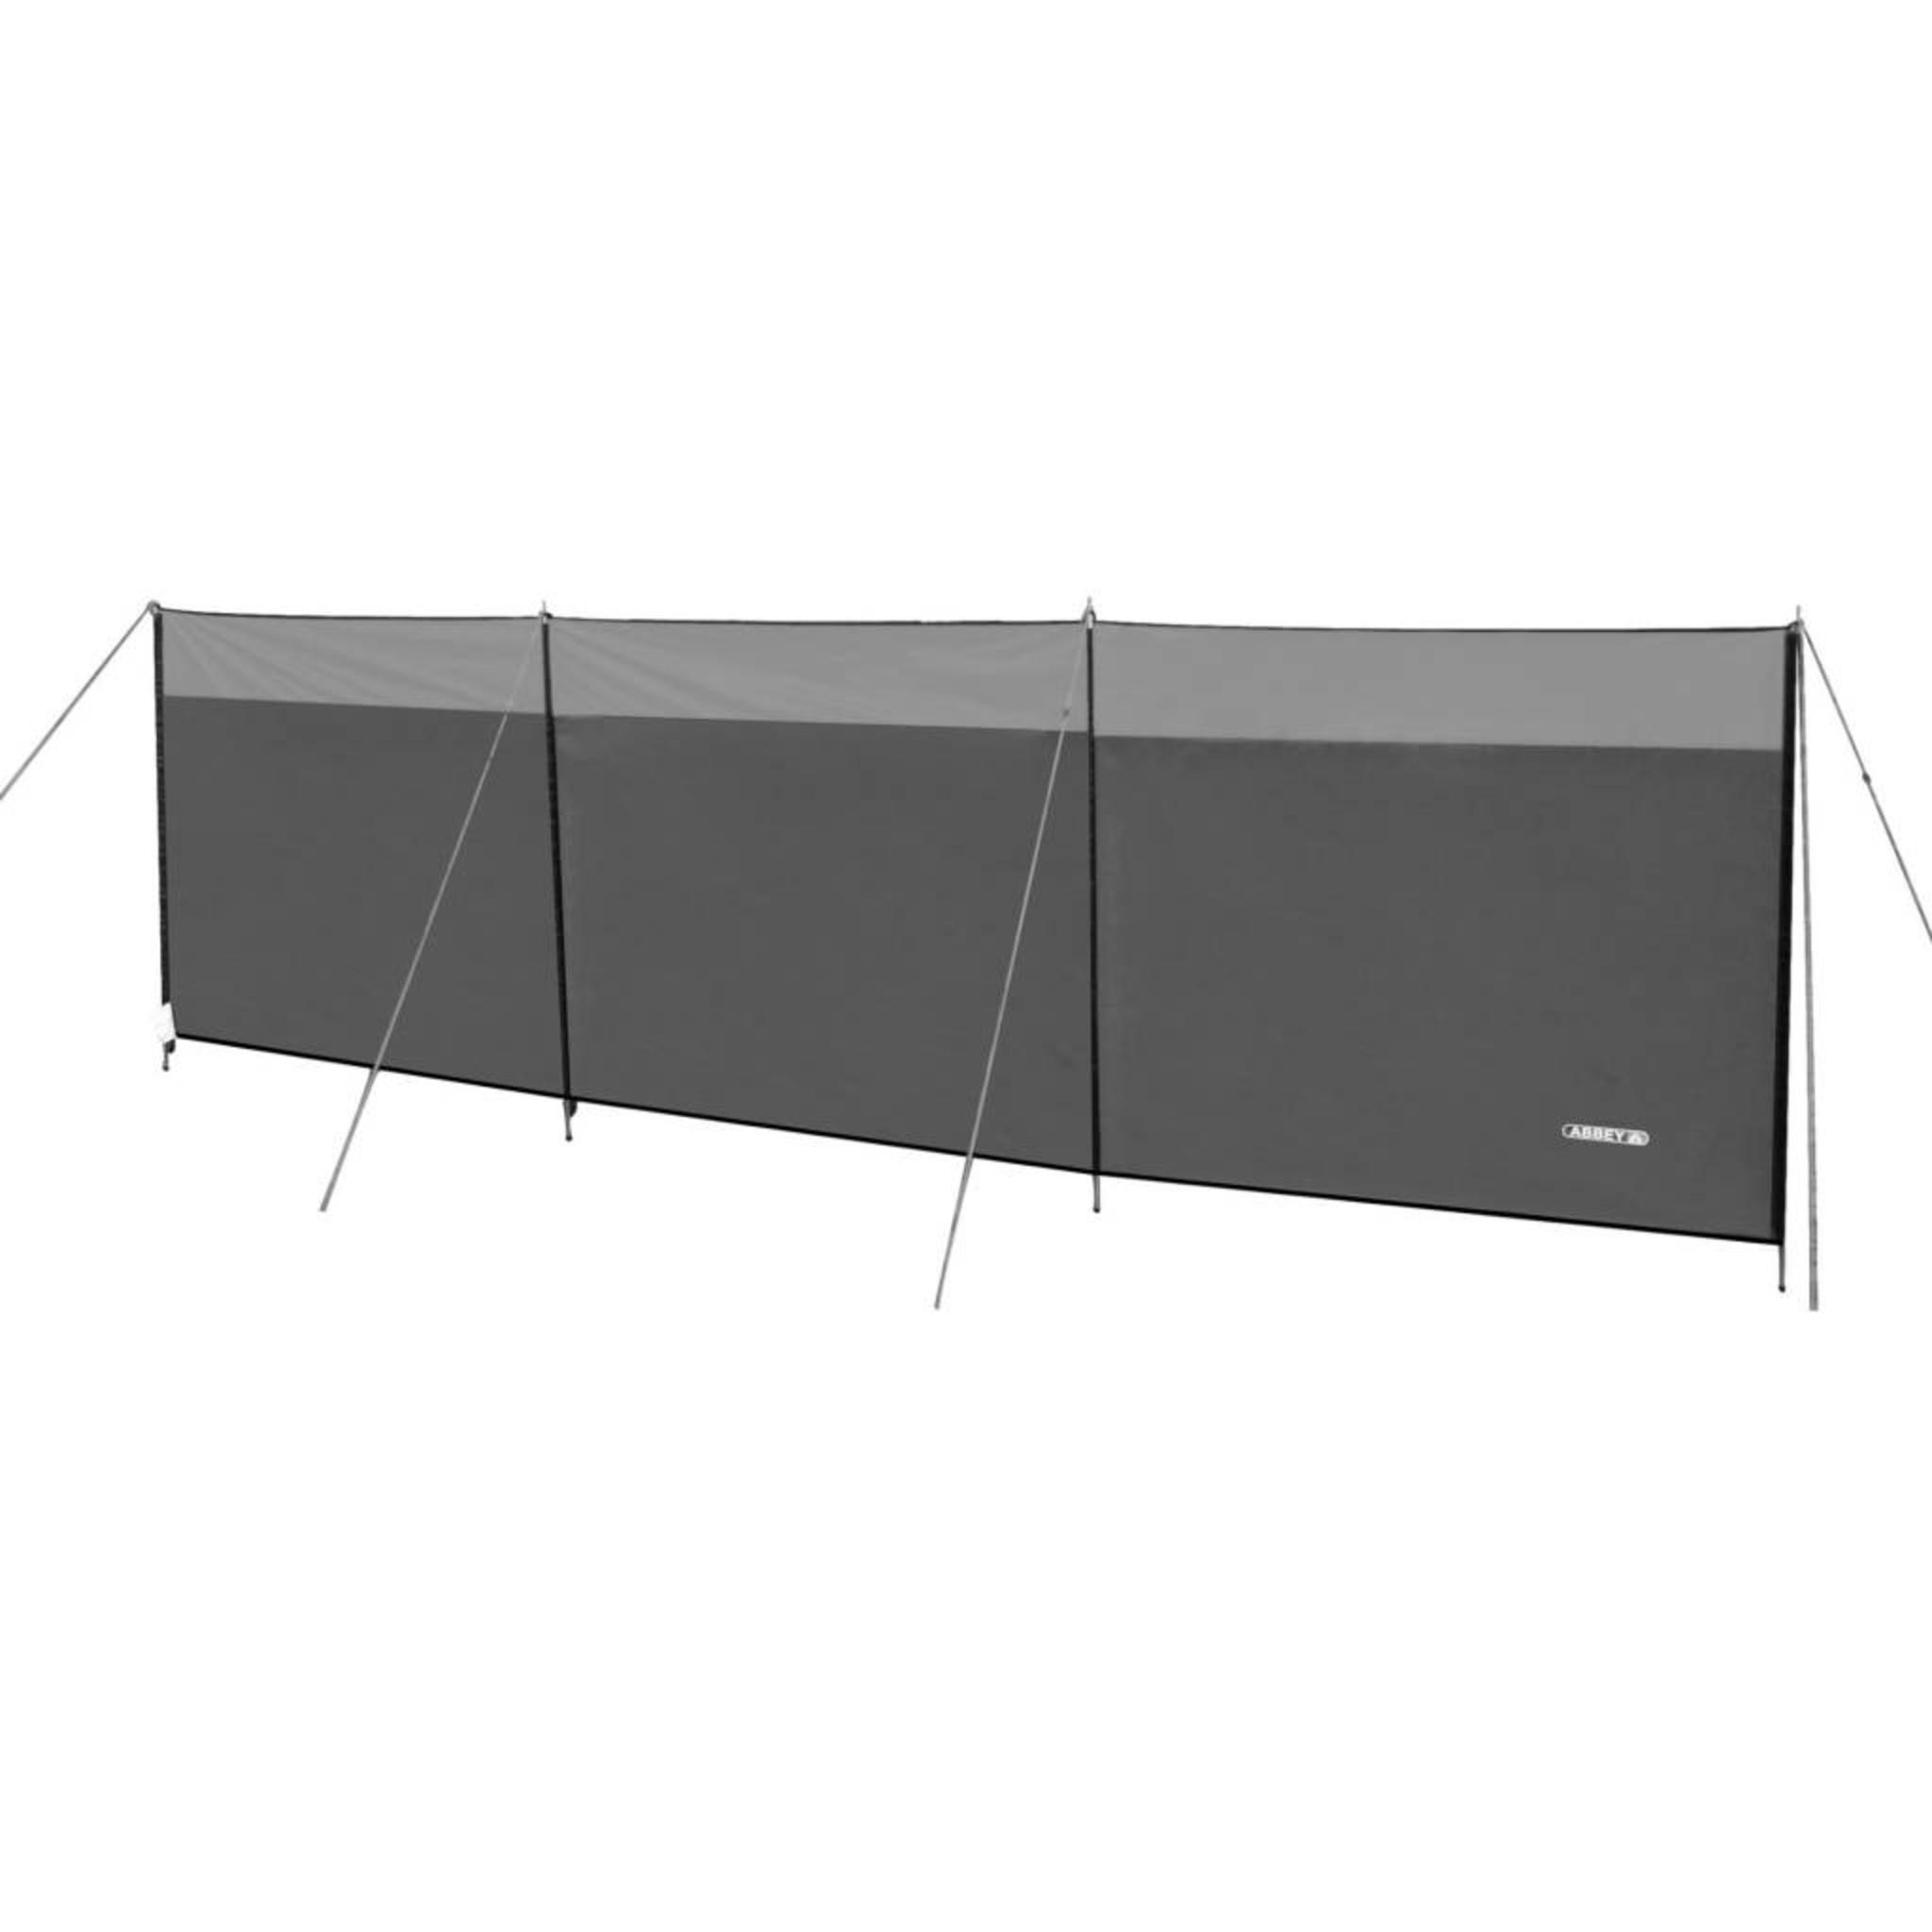 Abbey Camp® Windscherm Polyester 5 Meter